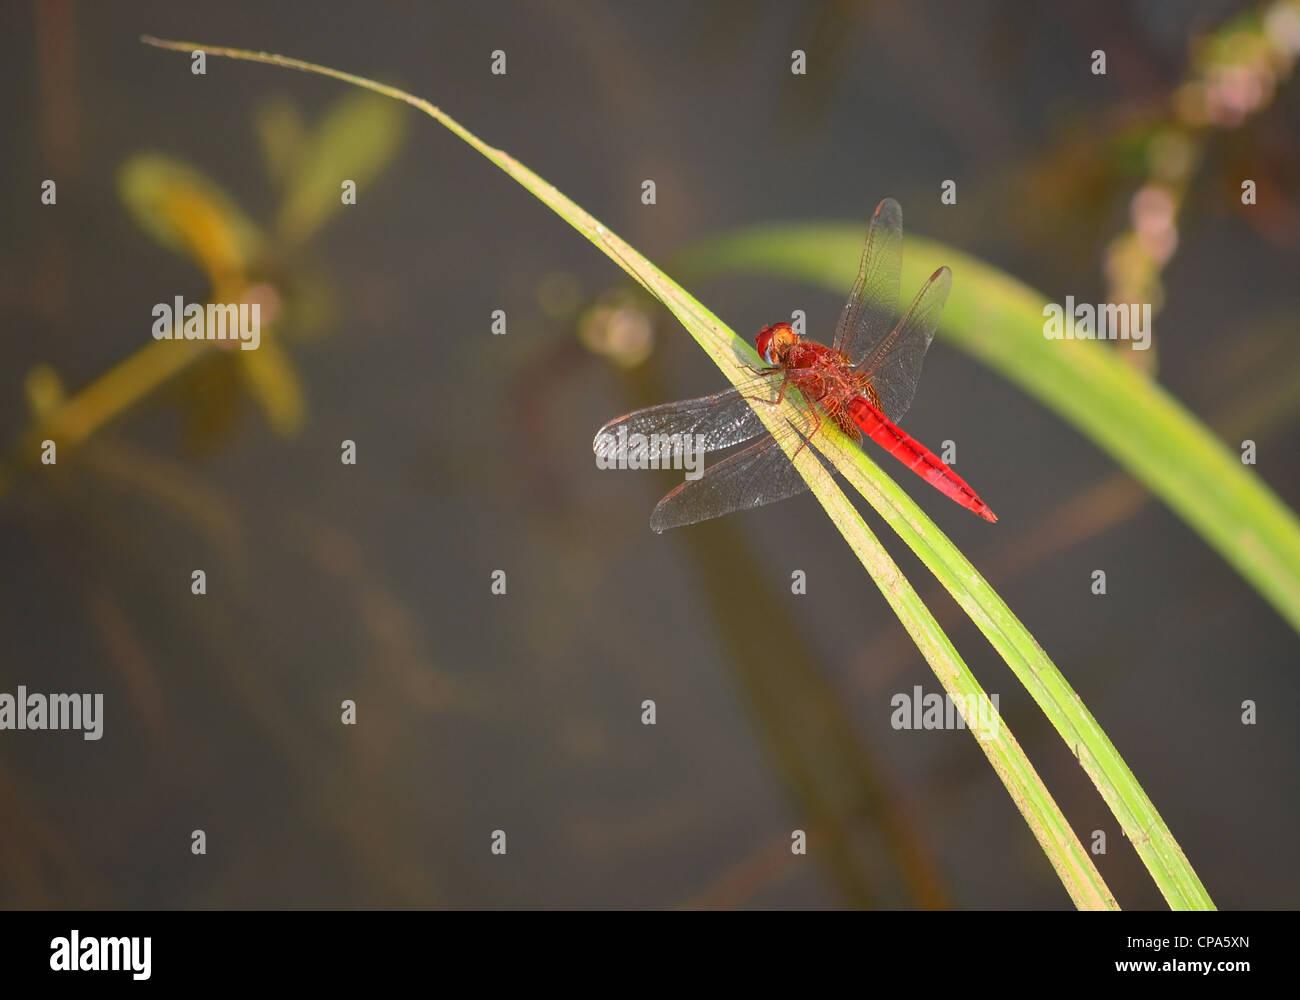 Red dragonfly / Crocothemis erythraea Stock Photo